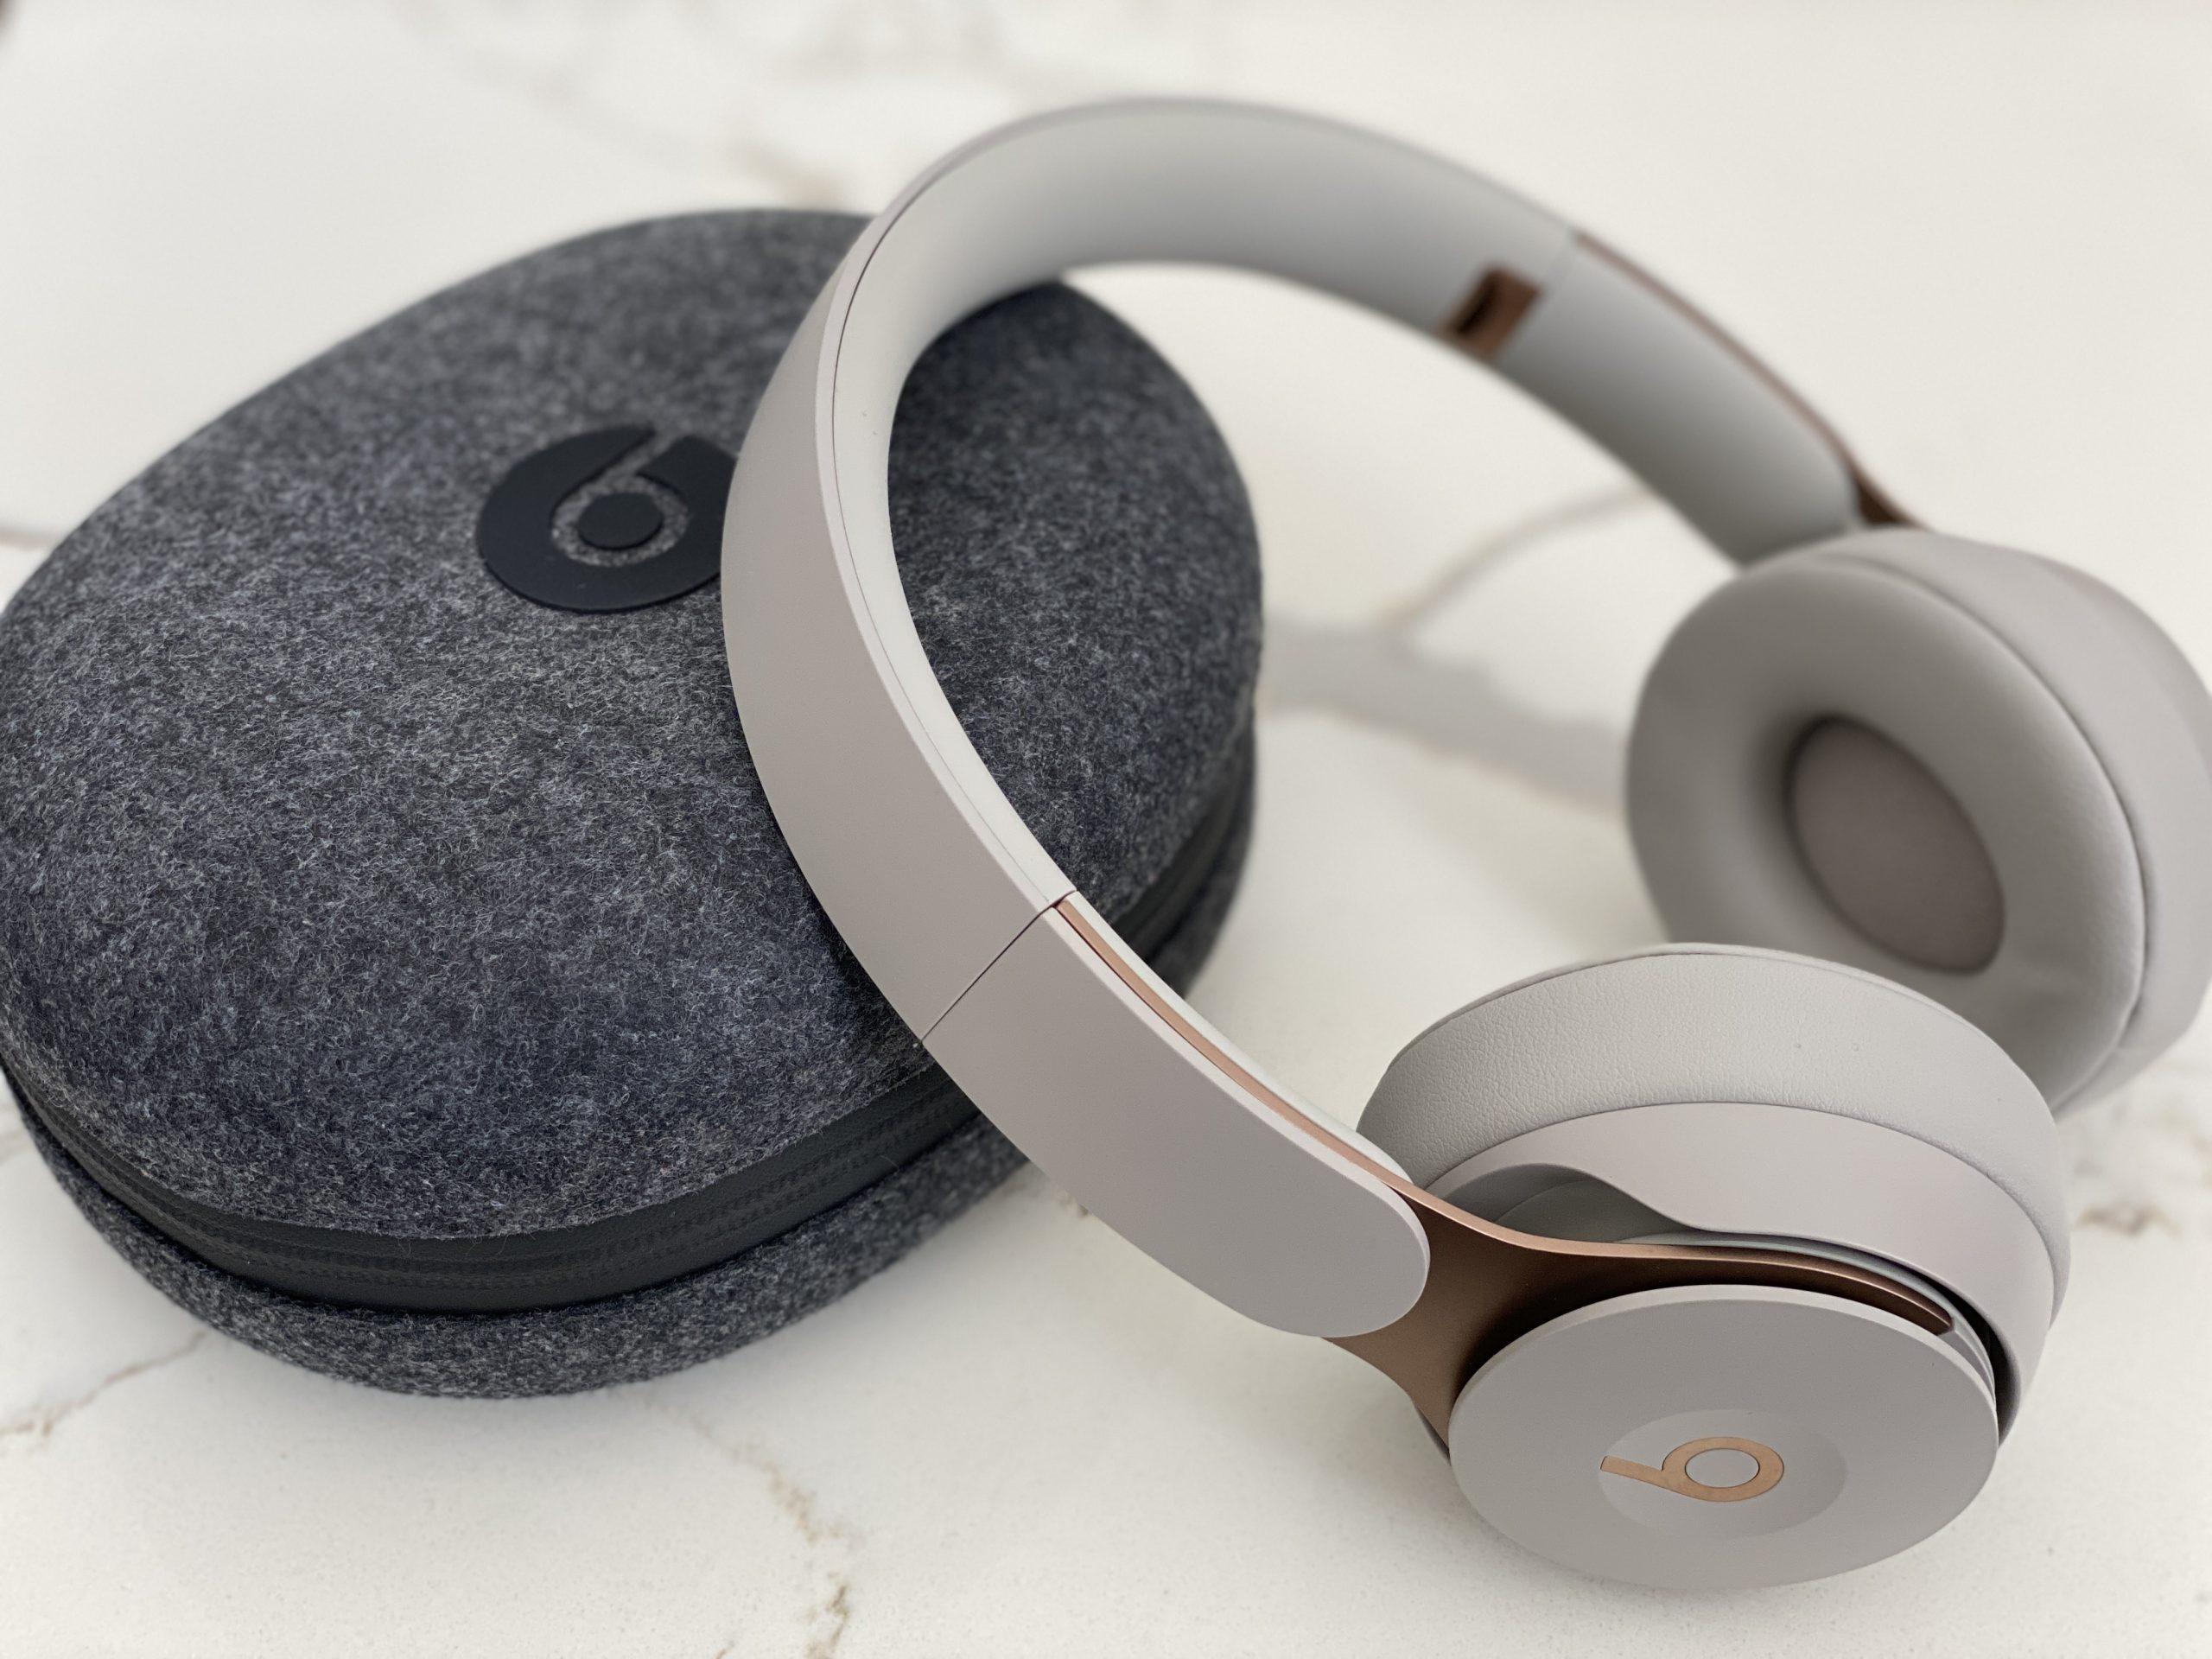 Testamos o fone de ouvido Beats Solo Pro Wireless | Review 360